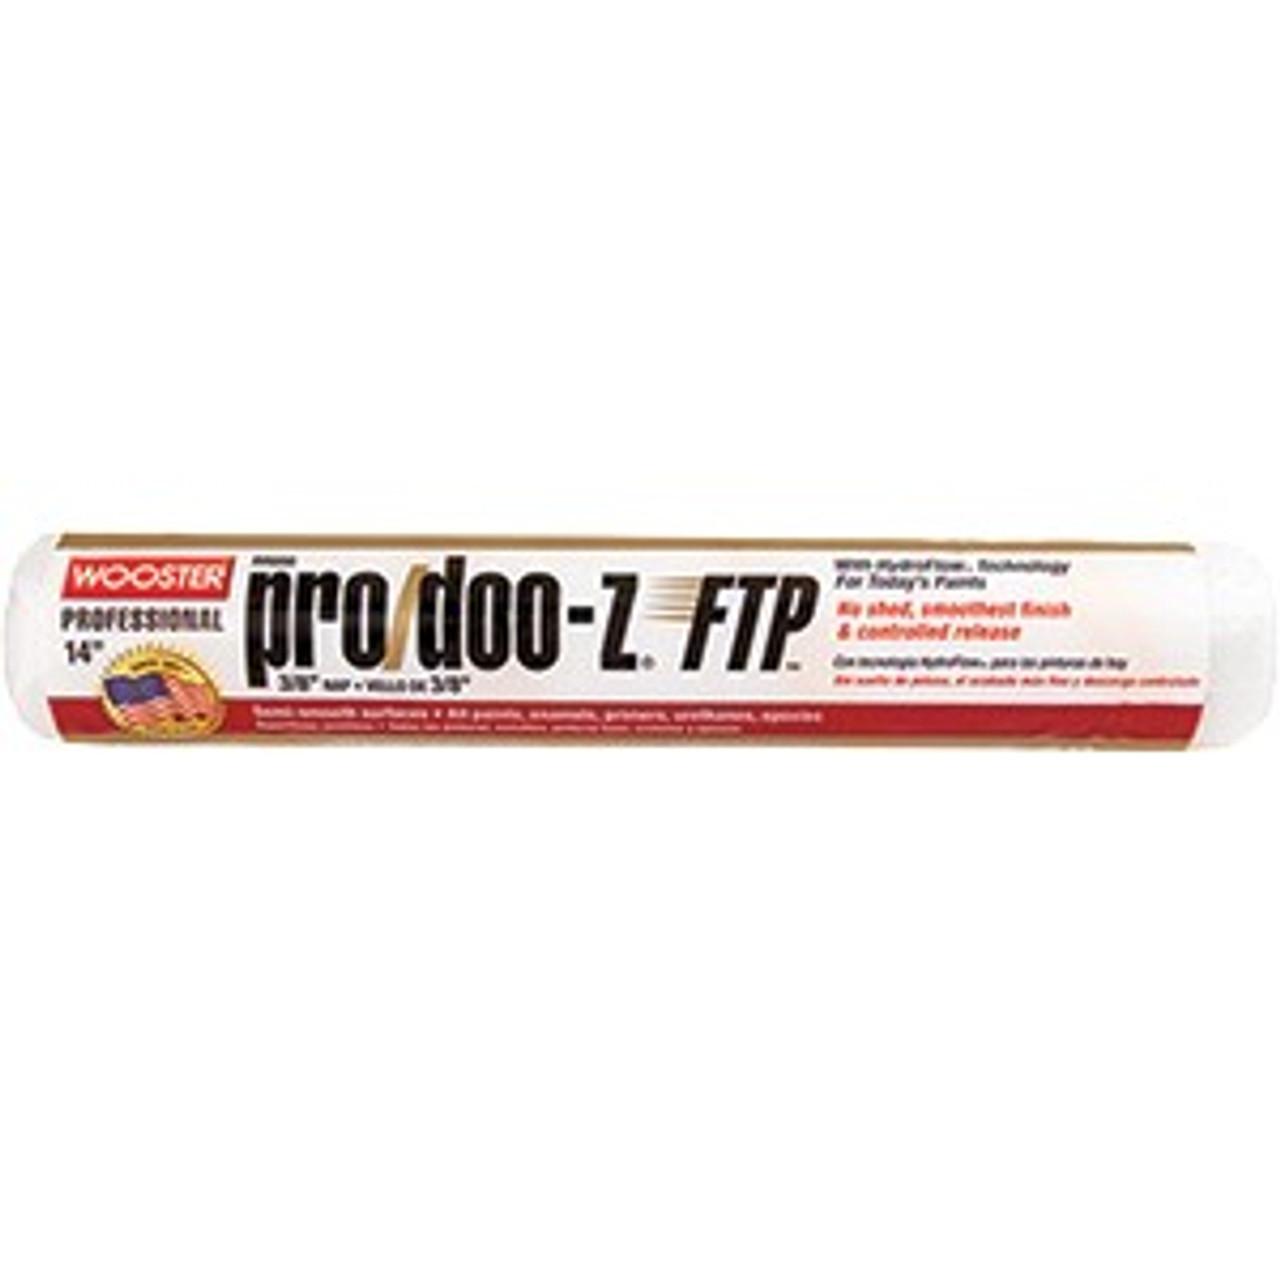 "Wooster RR666 14"" Pro/Doo-Z FTP 3/8"" Nap Roller Cover"